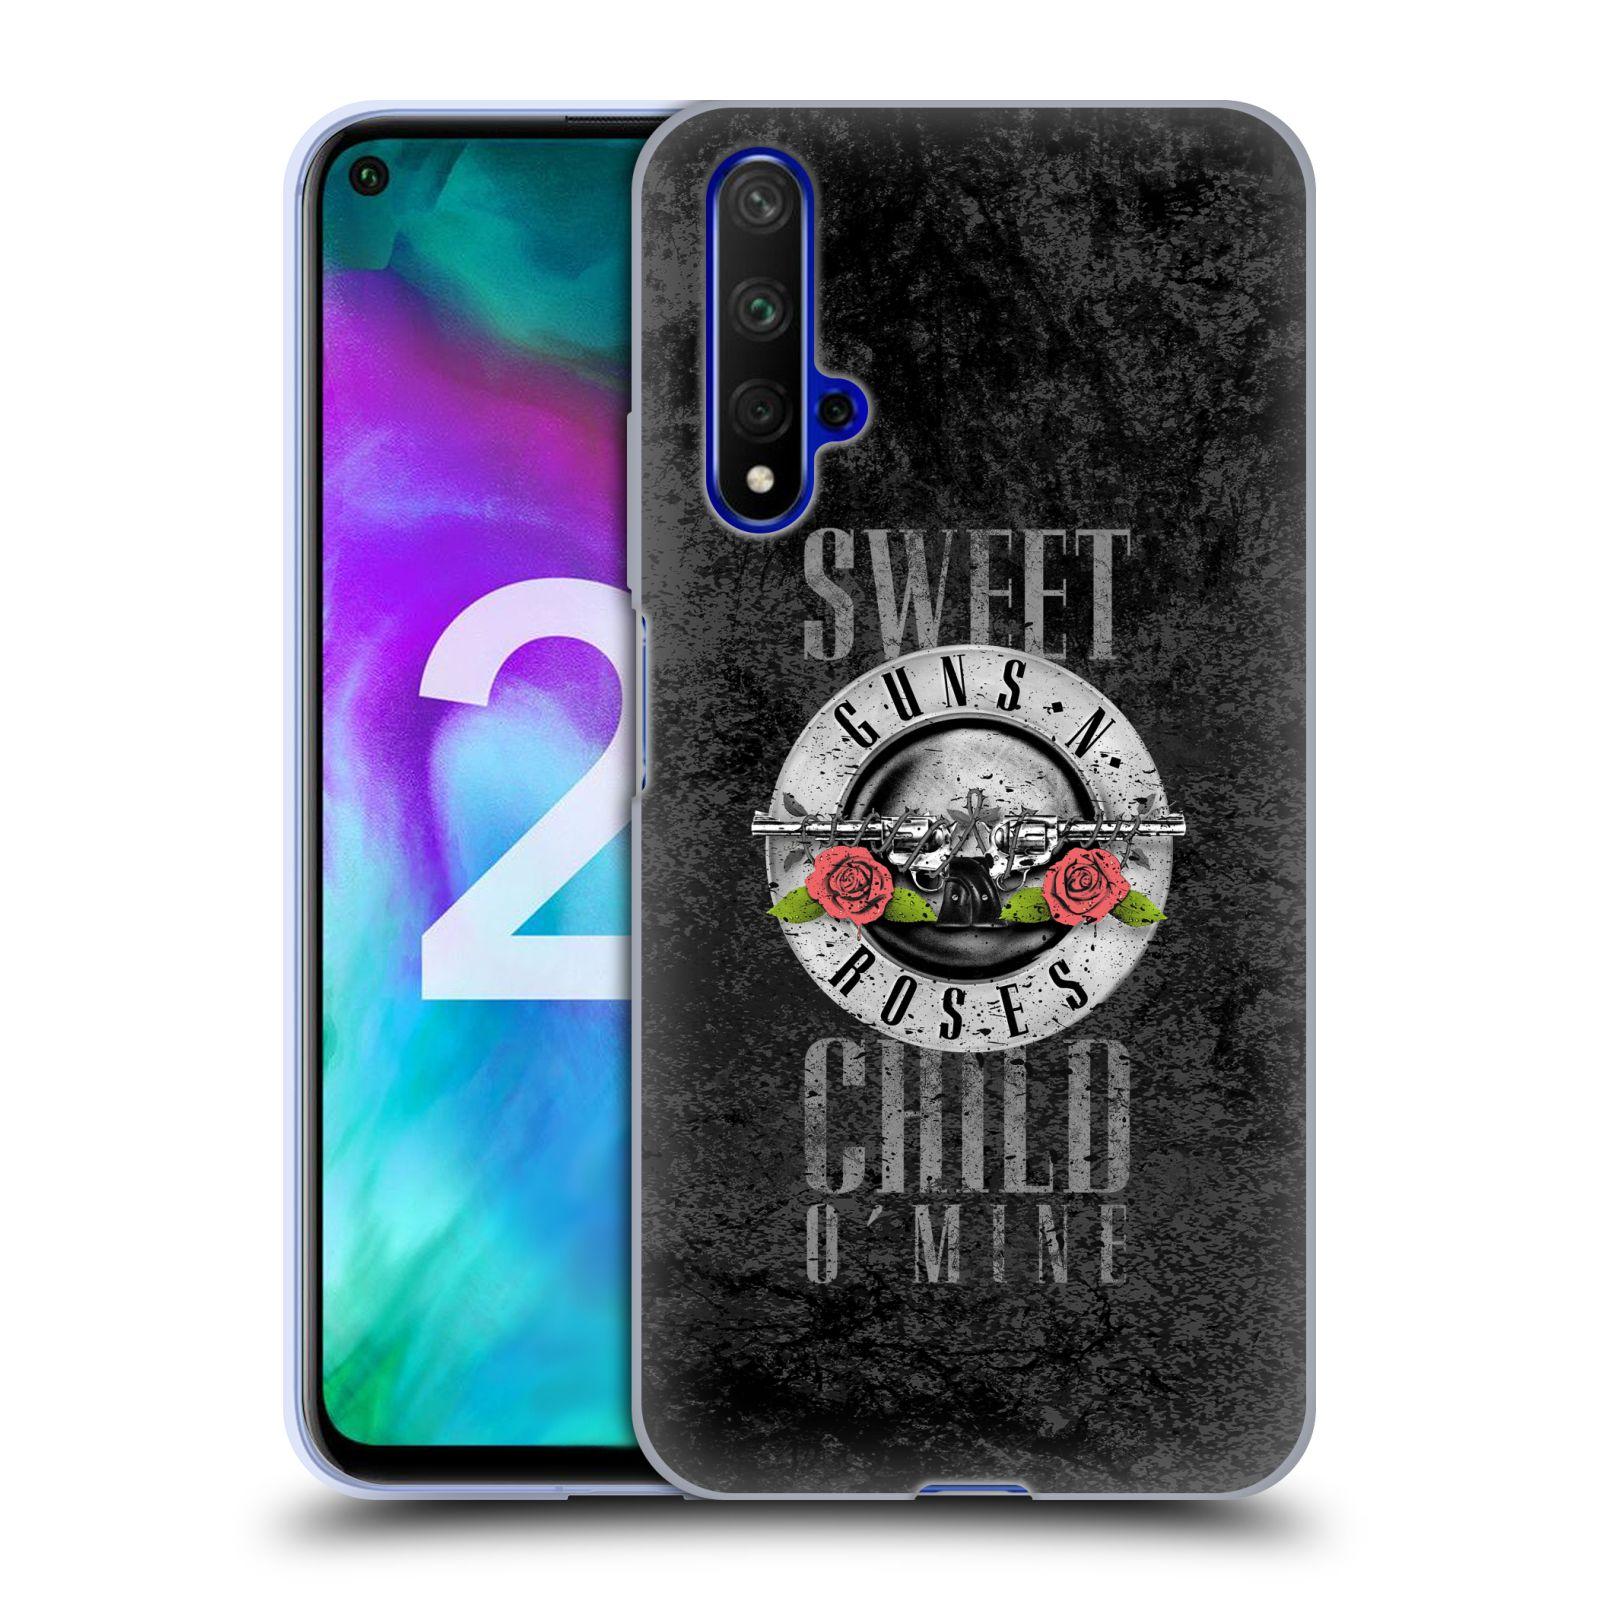 Silikonové pouzdro na mobil Honor 20 - Head Case - Guns N' Roses - Sweet Child